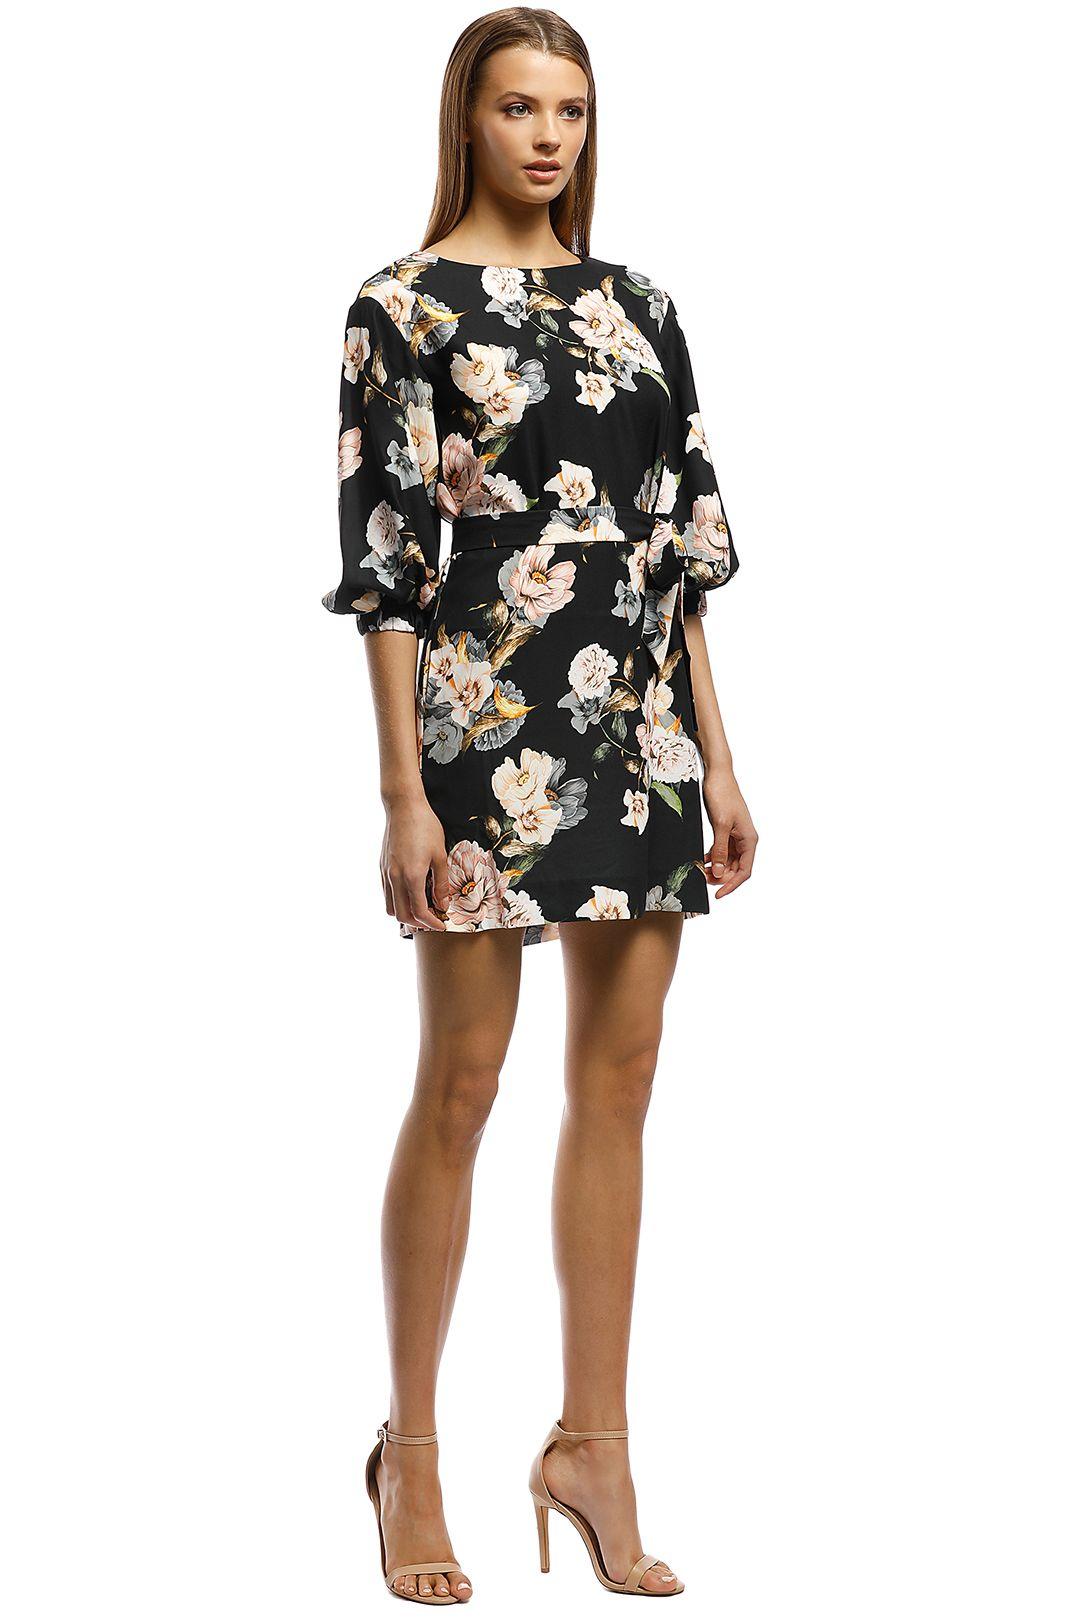 Rodeo Show-Natalia Mini Dress-Black Floral-Side